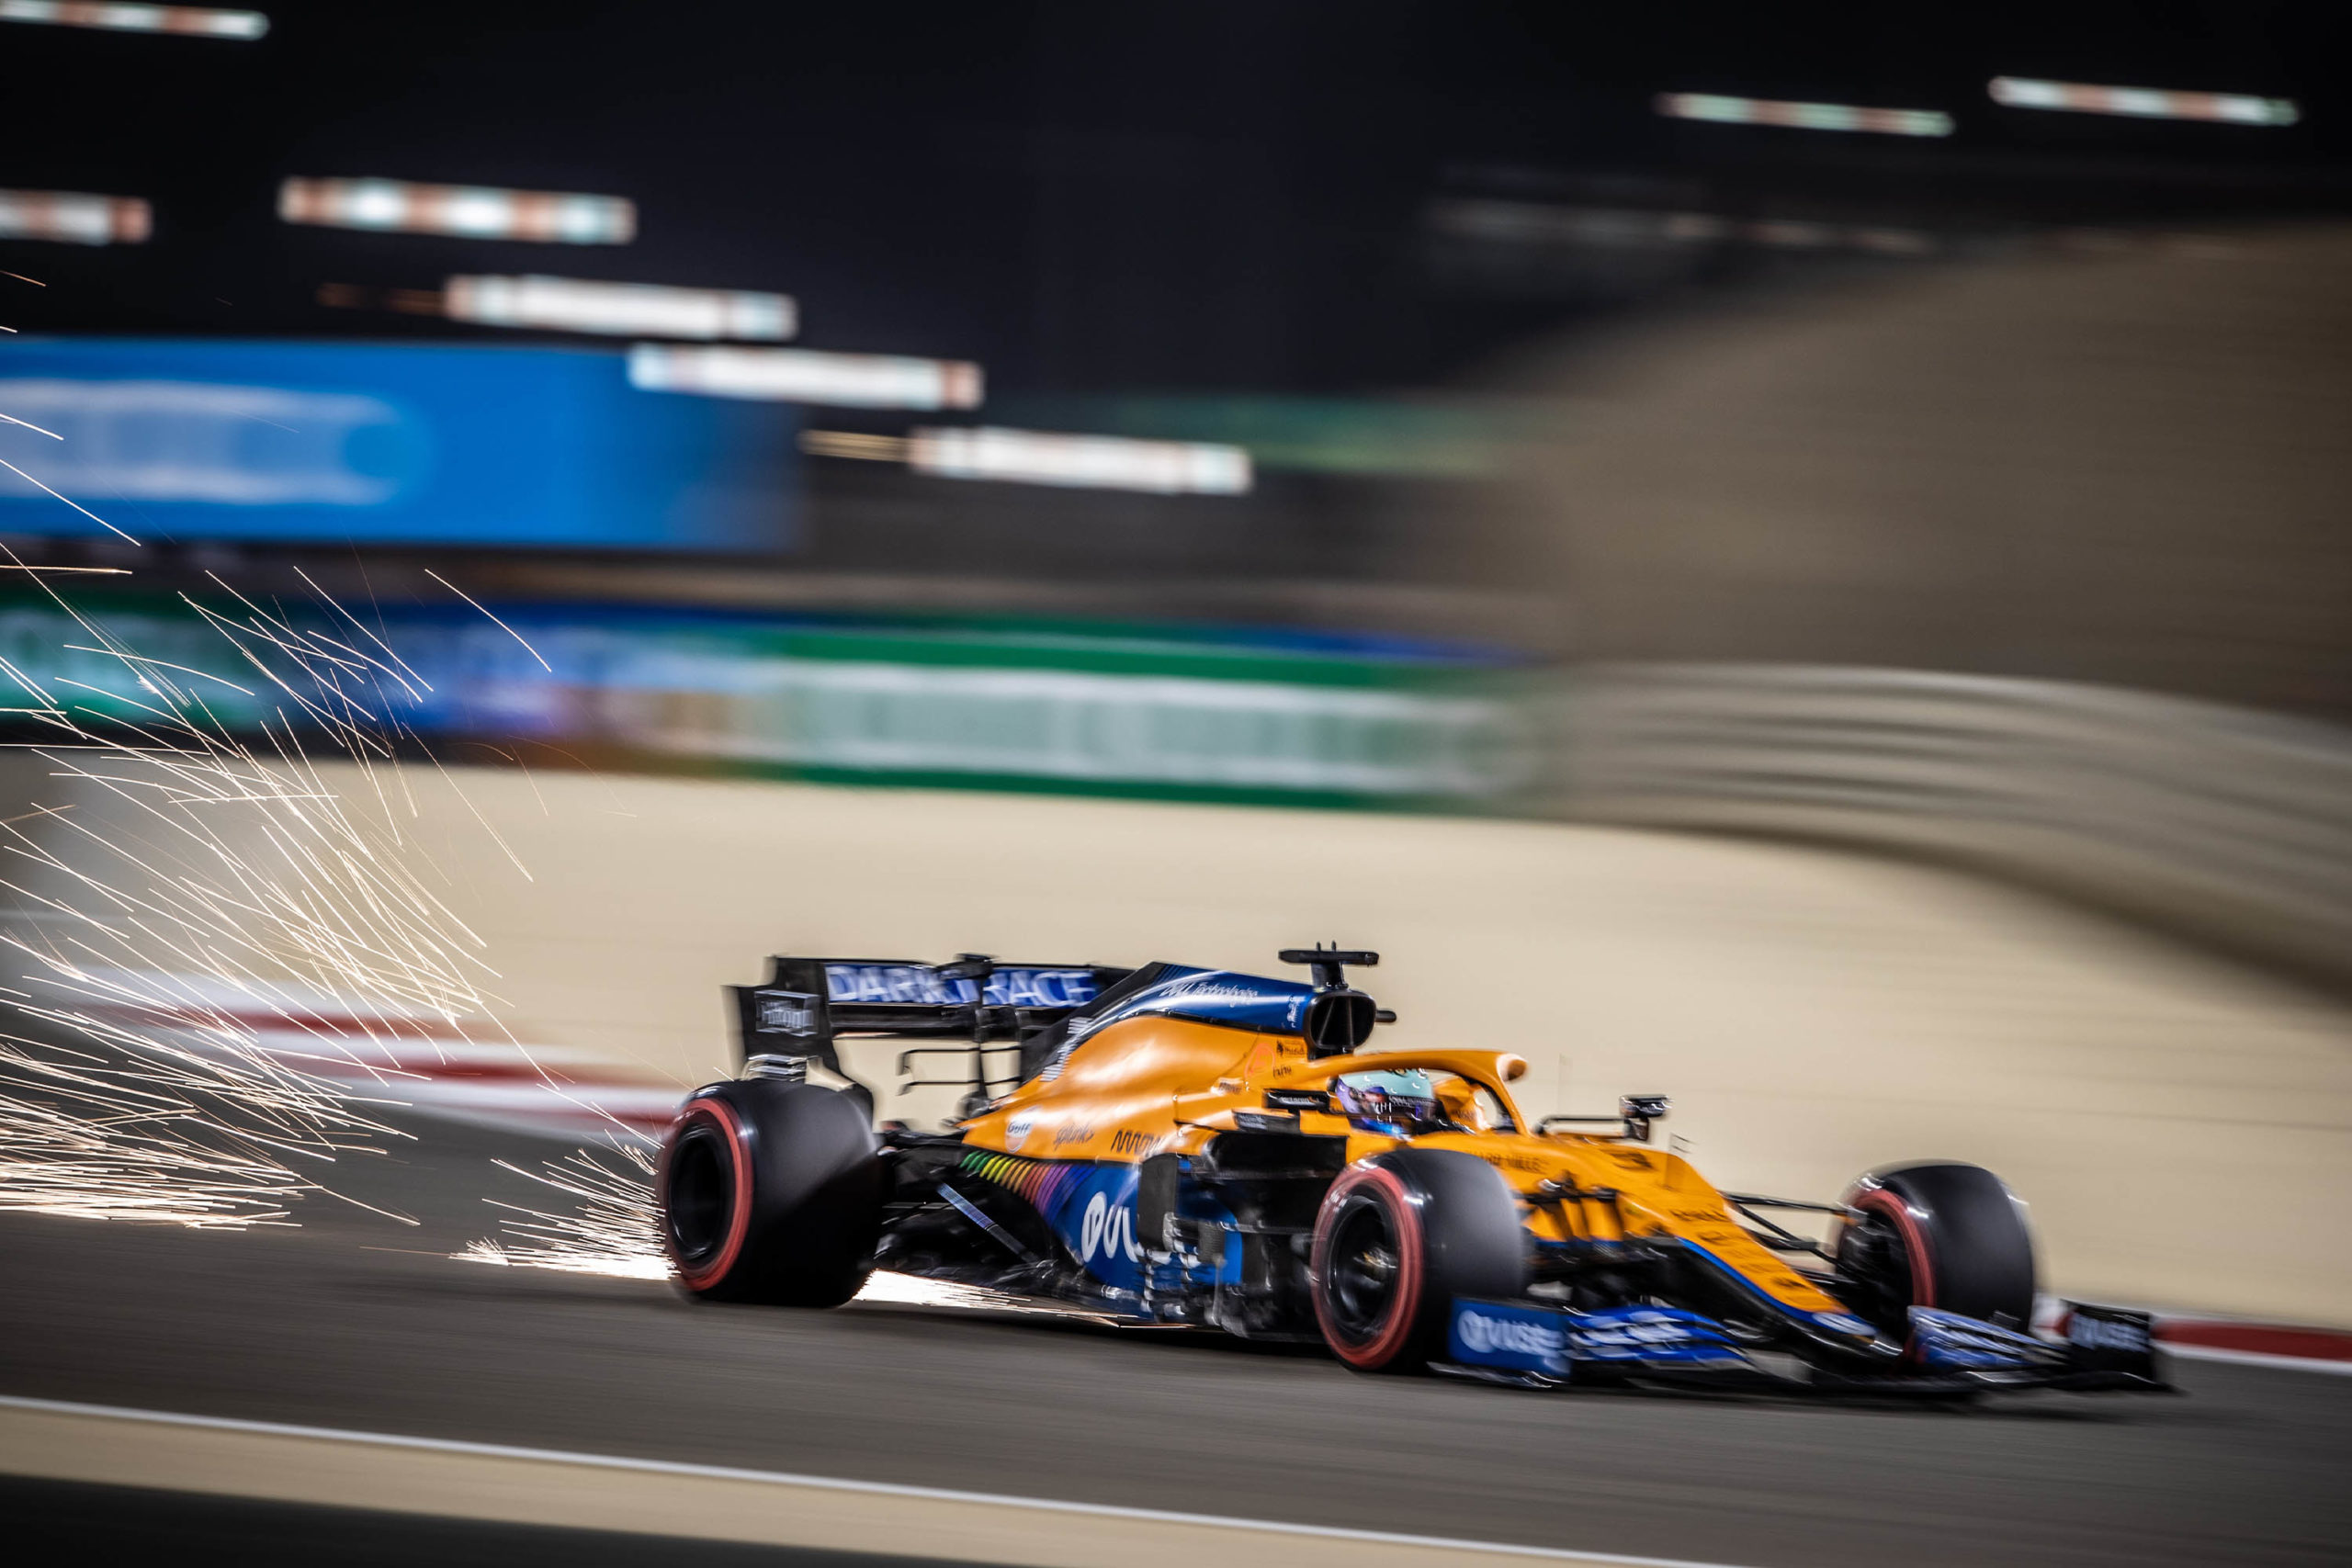 Daniel Ricciardo in qualifying for the 2021 Bahrain Grand Prix